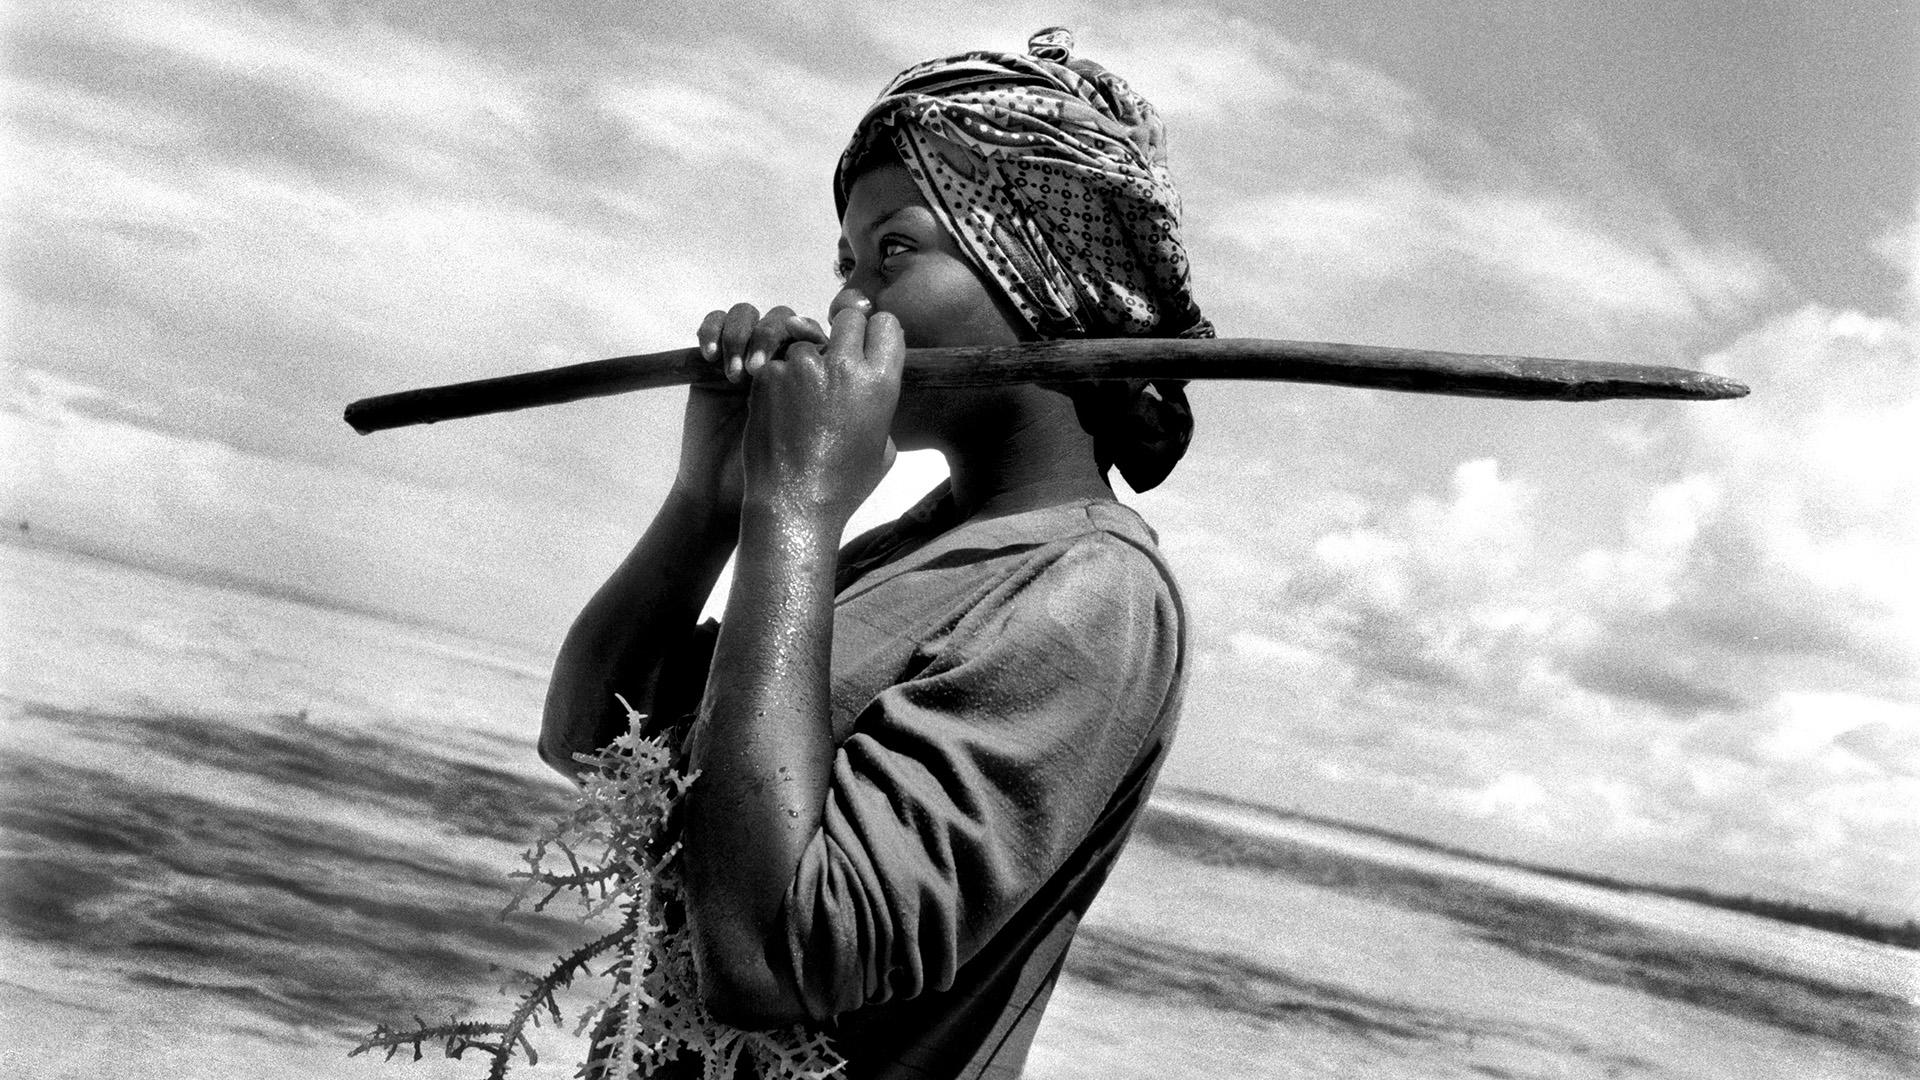 Le donne alghe - danilo de marco - Fotografo: danilo de marco